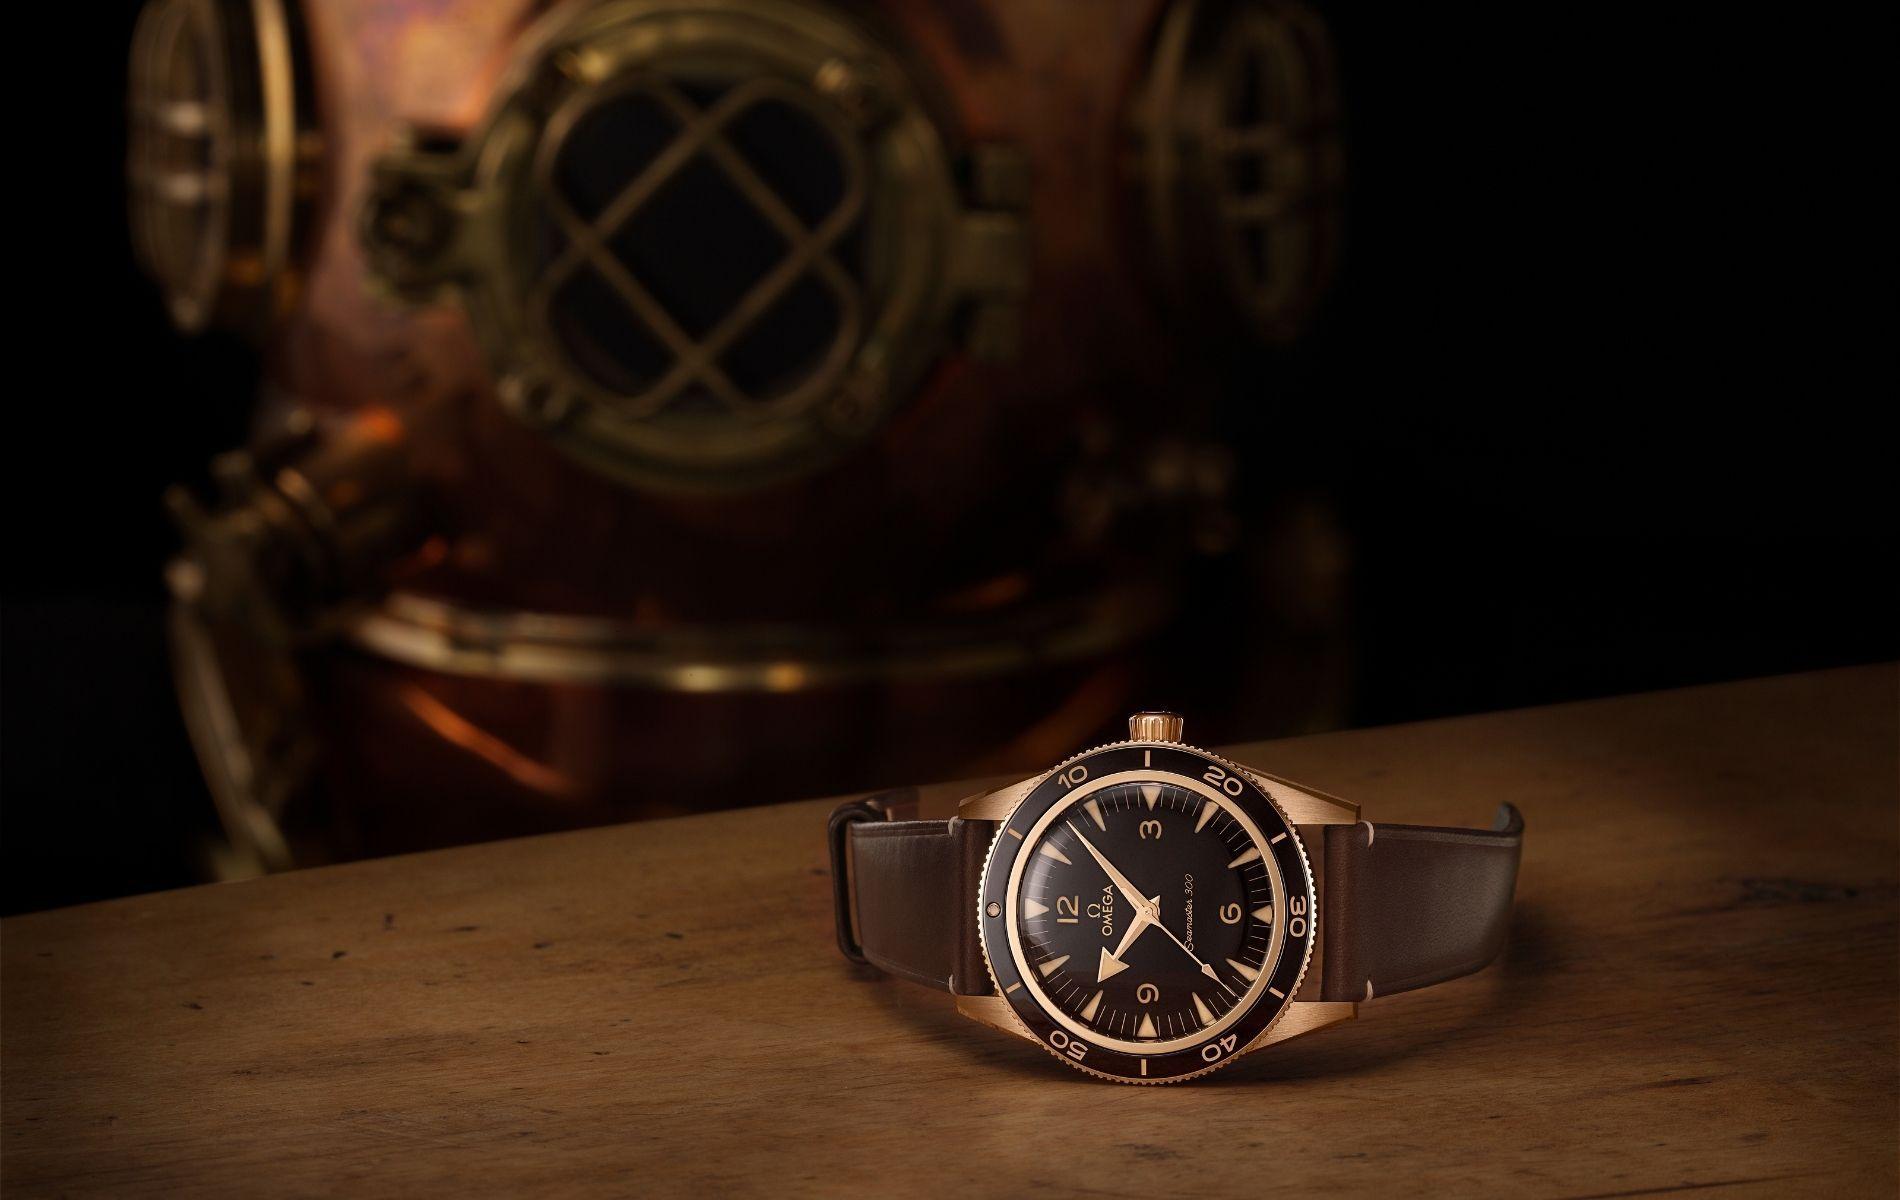 Omega Seamaster 300 in bronze-gold